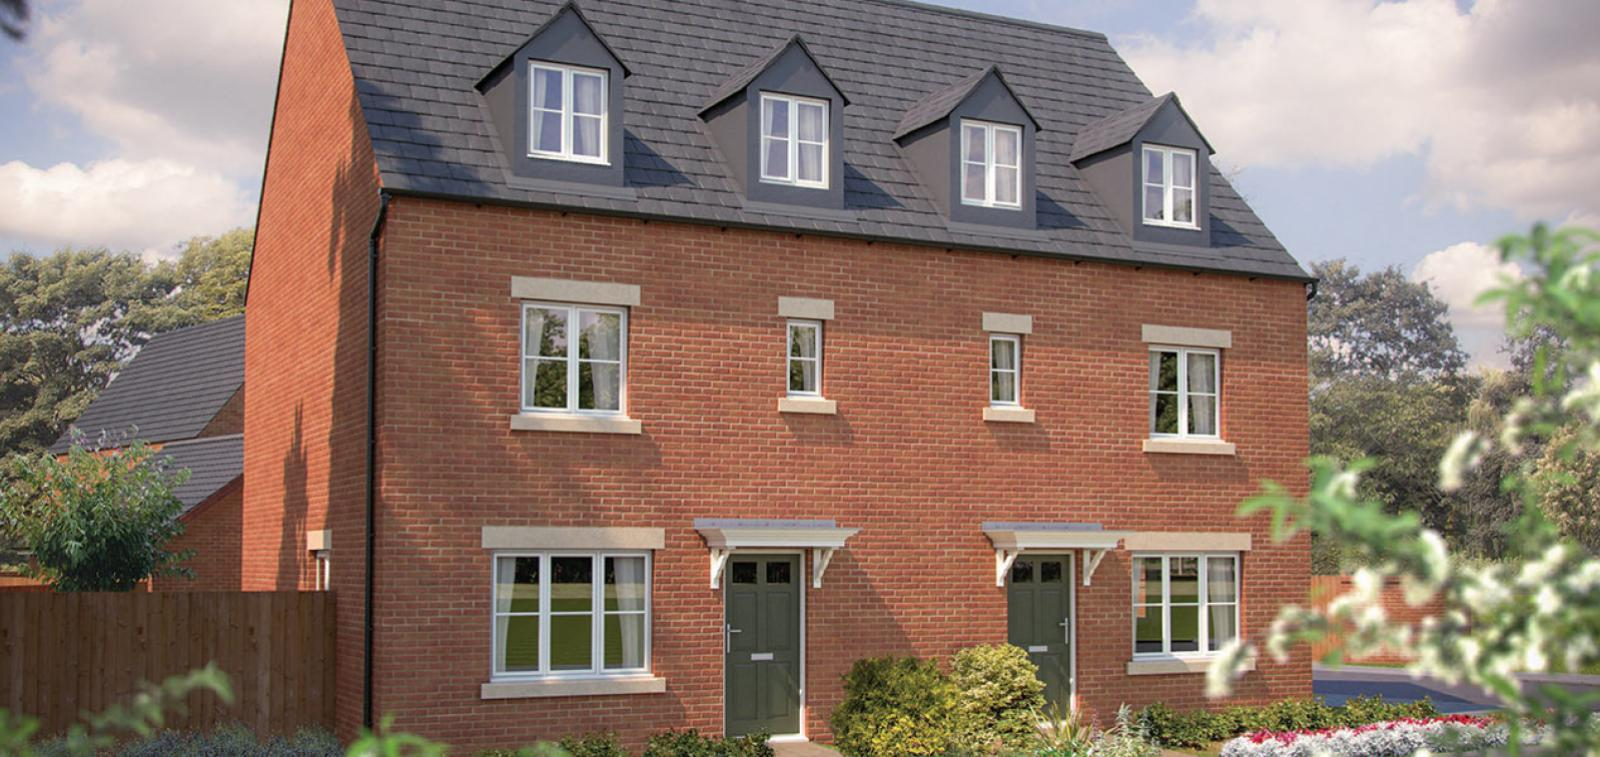 Longford Park development in Banbury, Oxfordshire